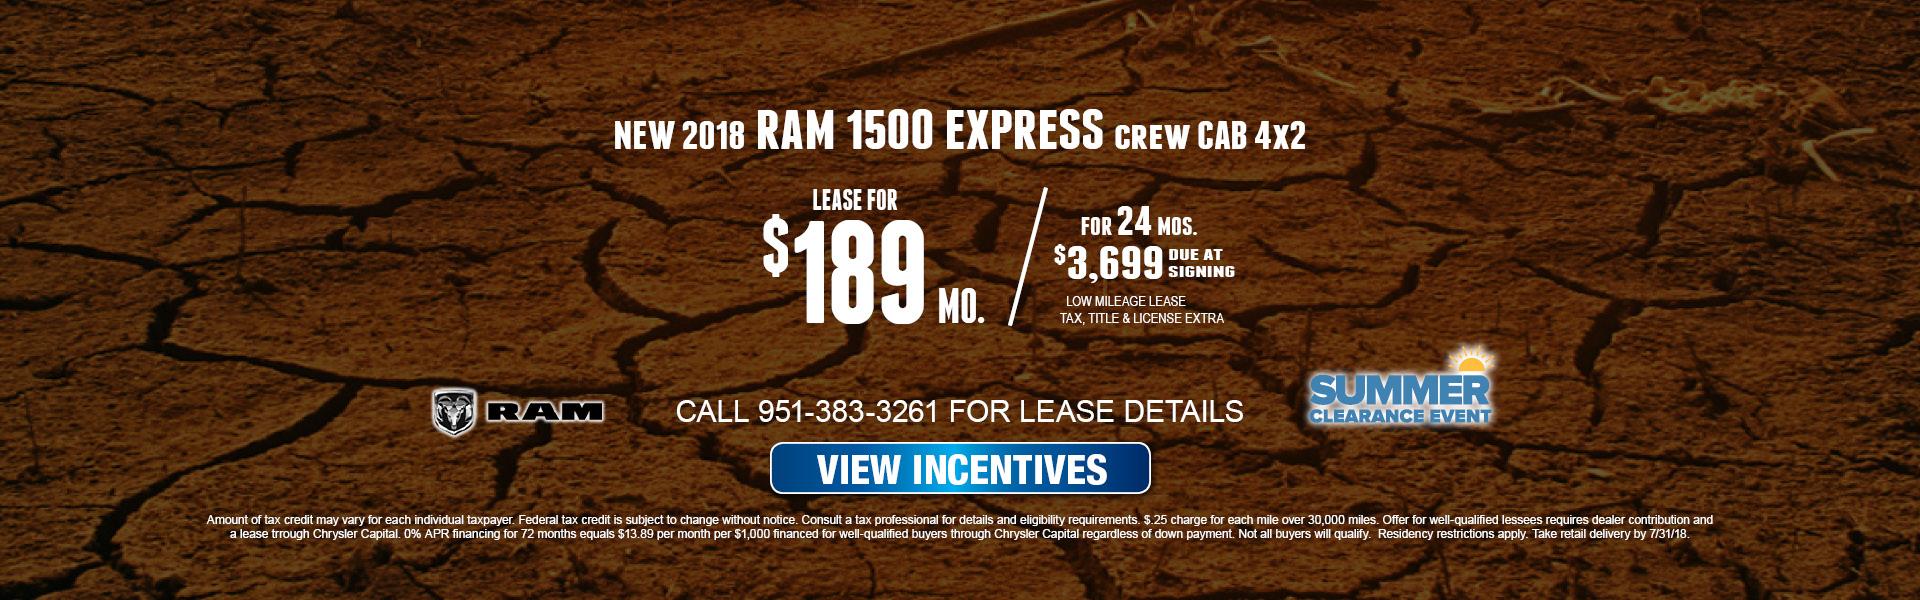 Ram 1500 Express $189 Lease